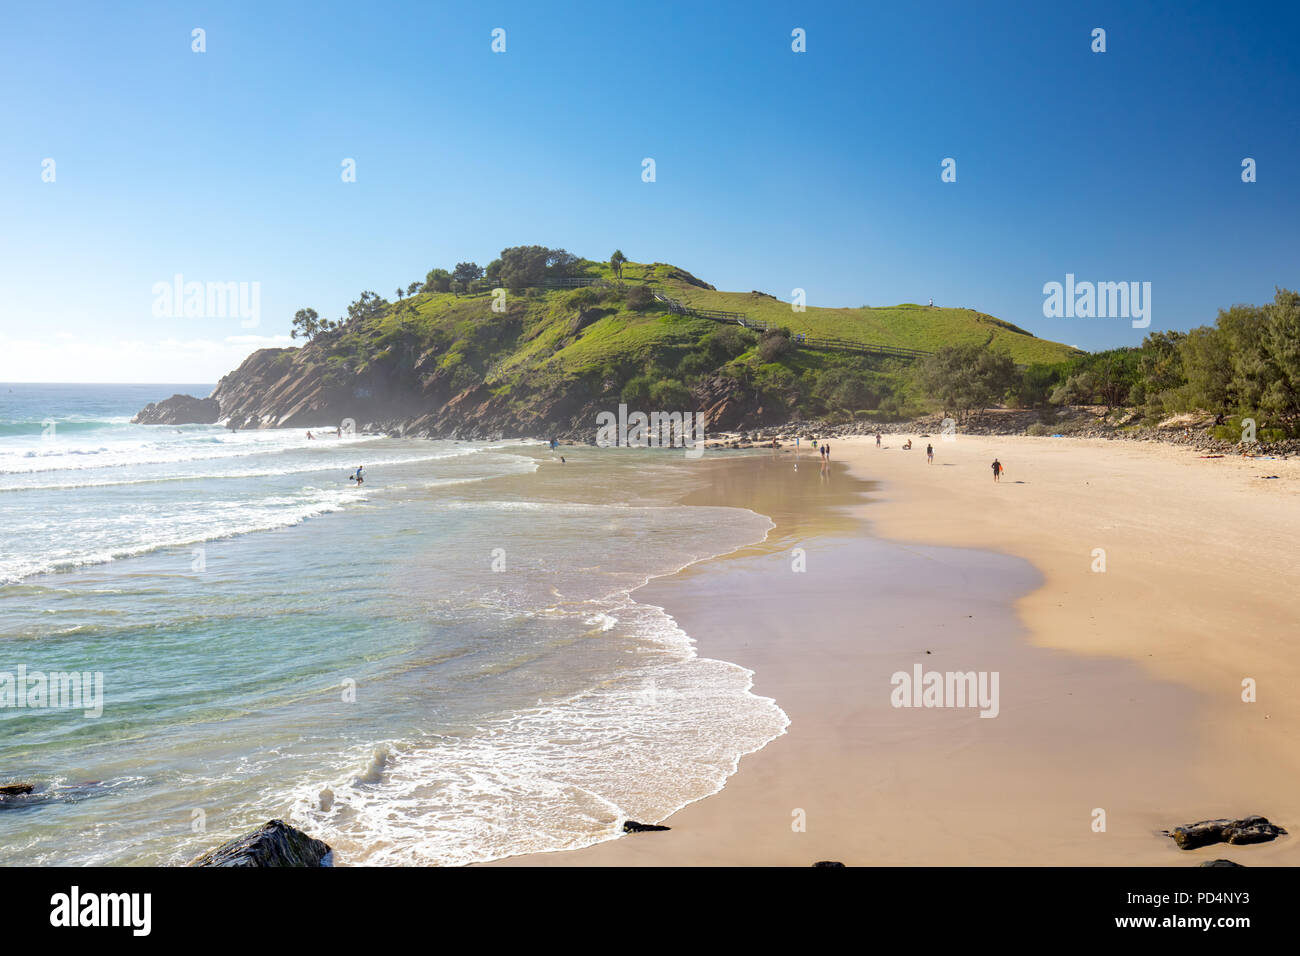 Cabarita Beach Australia - Stock Image